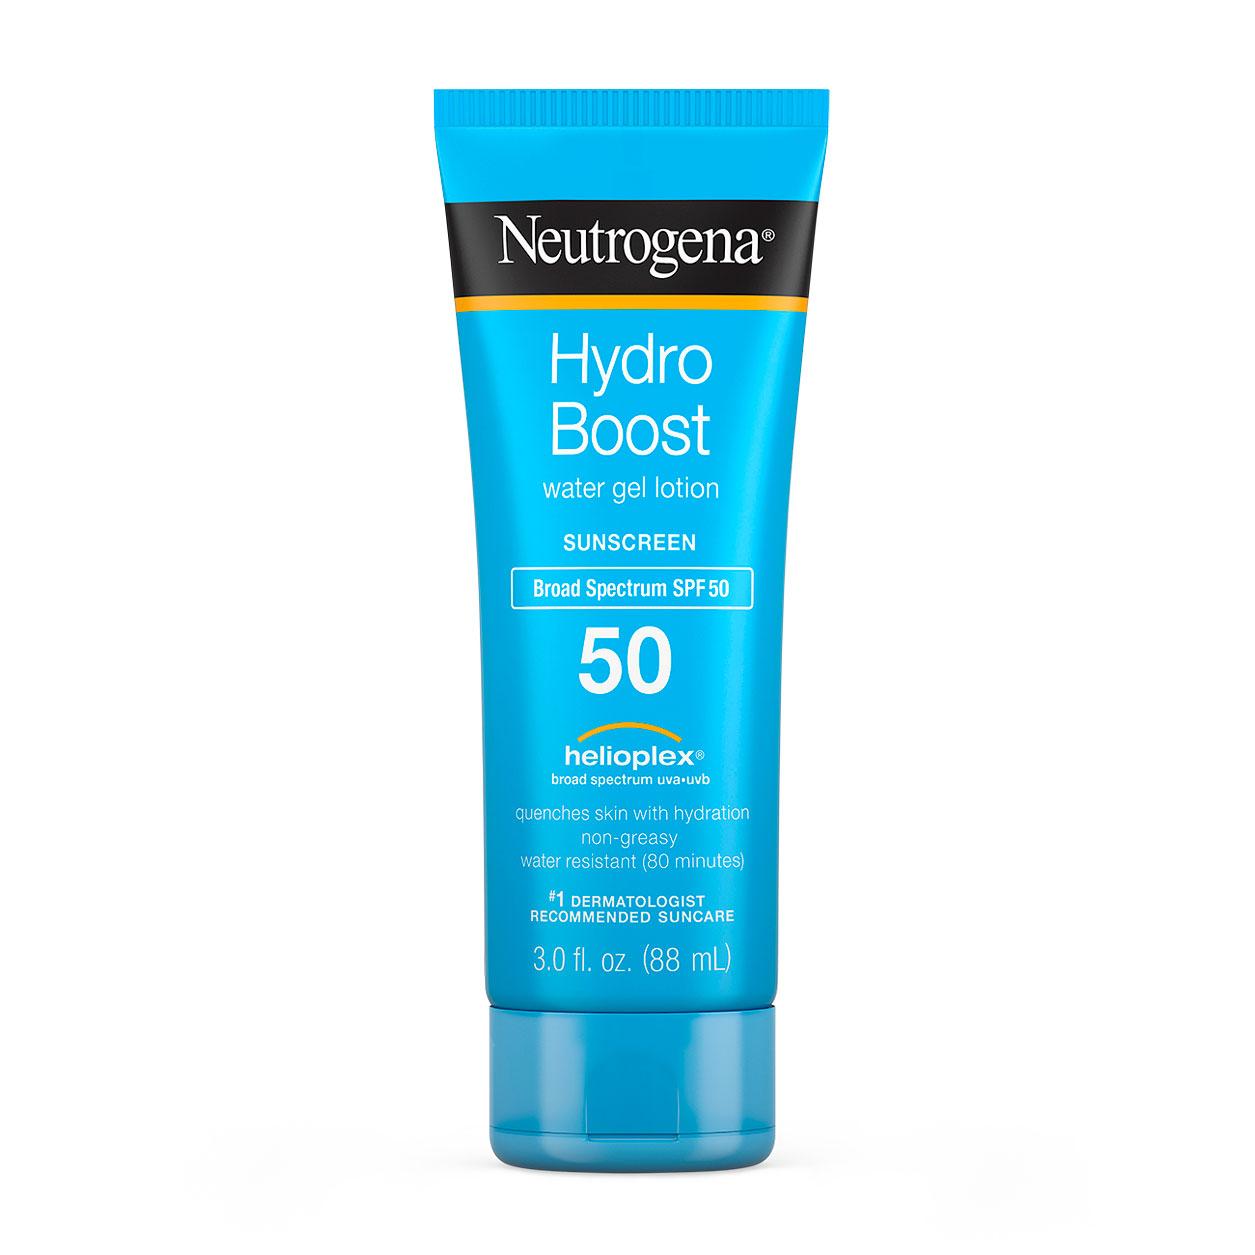 Neutrogena Hydro Boost Water Gel facial moisturizer with sunscreen